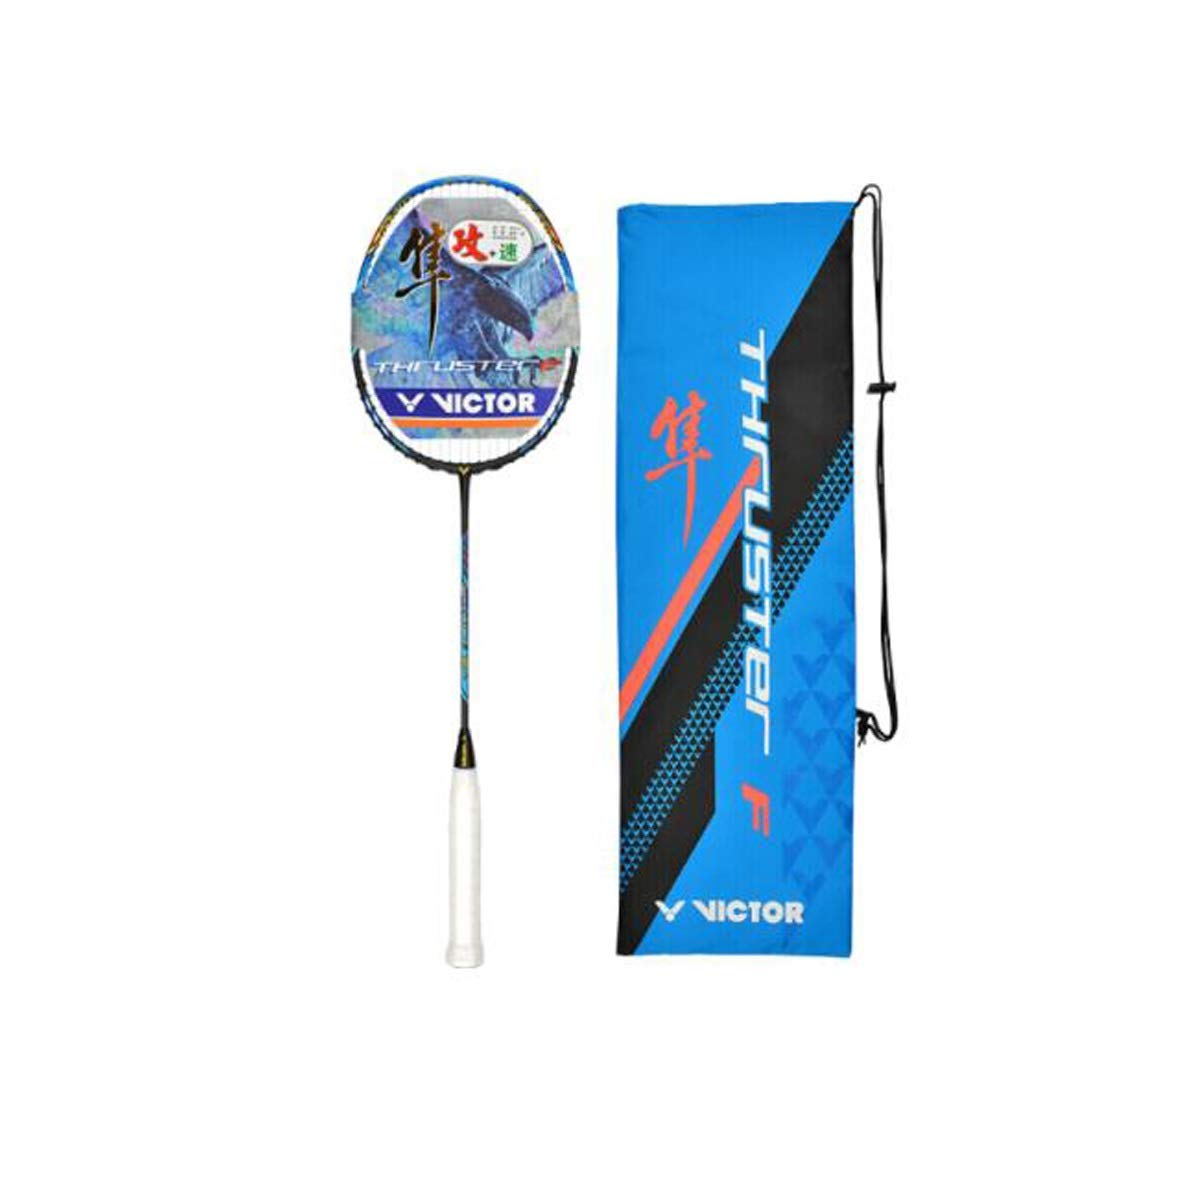 Tongboshi Badminton Racket, Offensive Full Carbon Badminton Racket, Single Shot TK-F隼4U (Professional Player Racket) Badminton Racket, (Design : 4U)